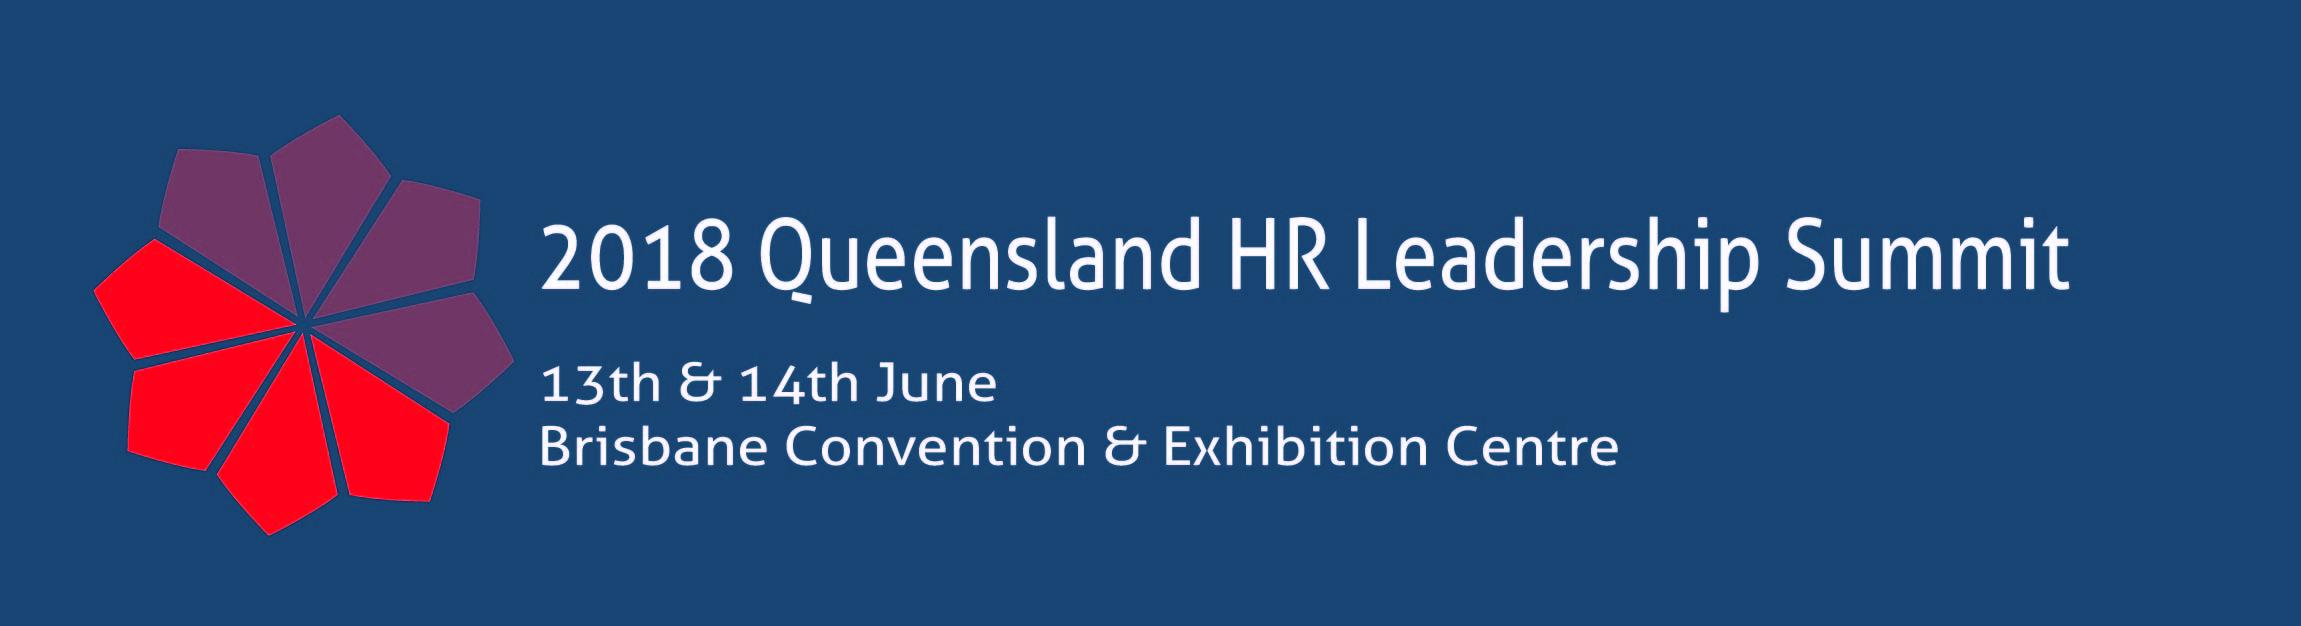 ELMO Queensland HR Leadership Summit